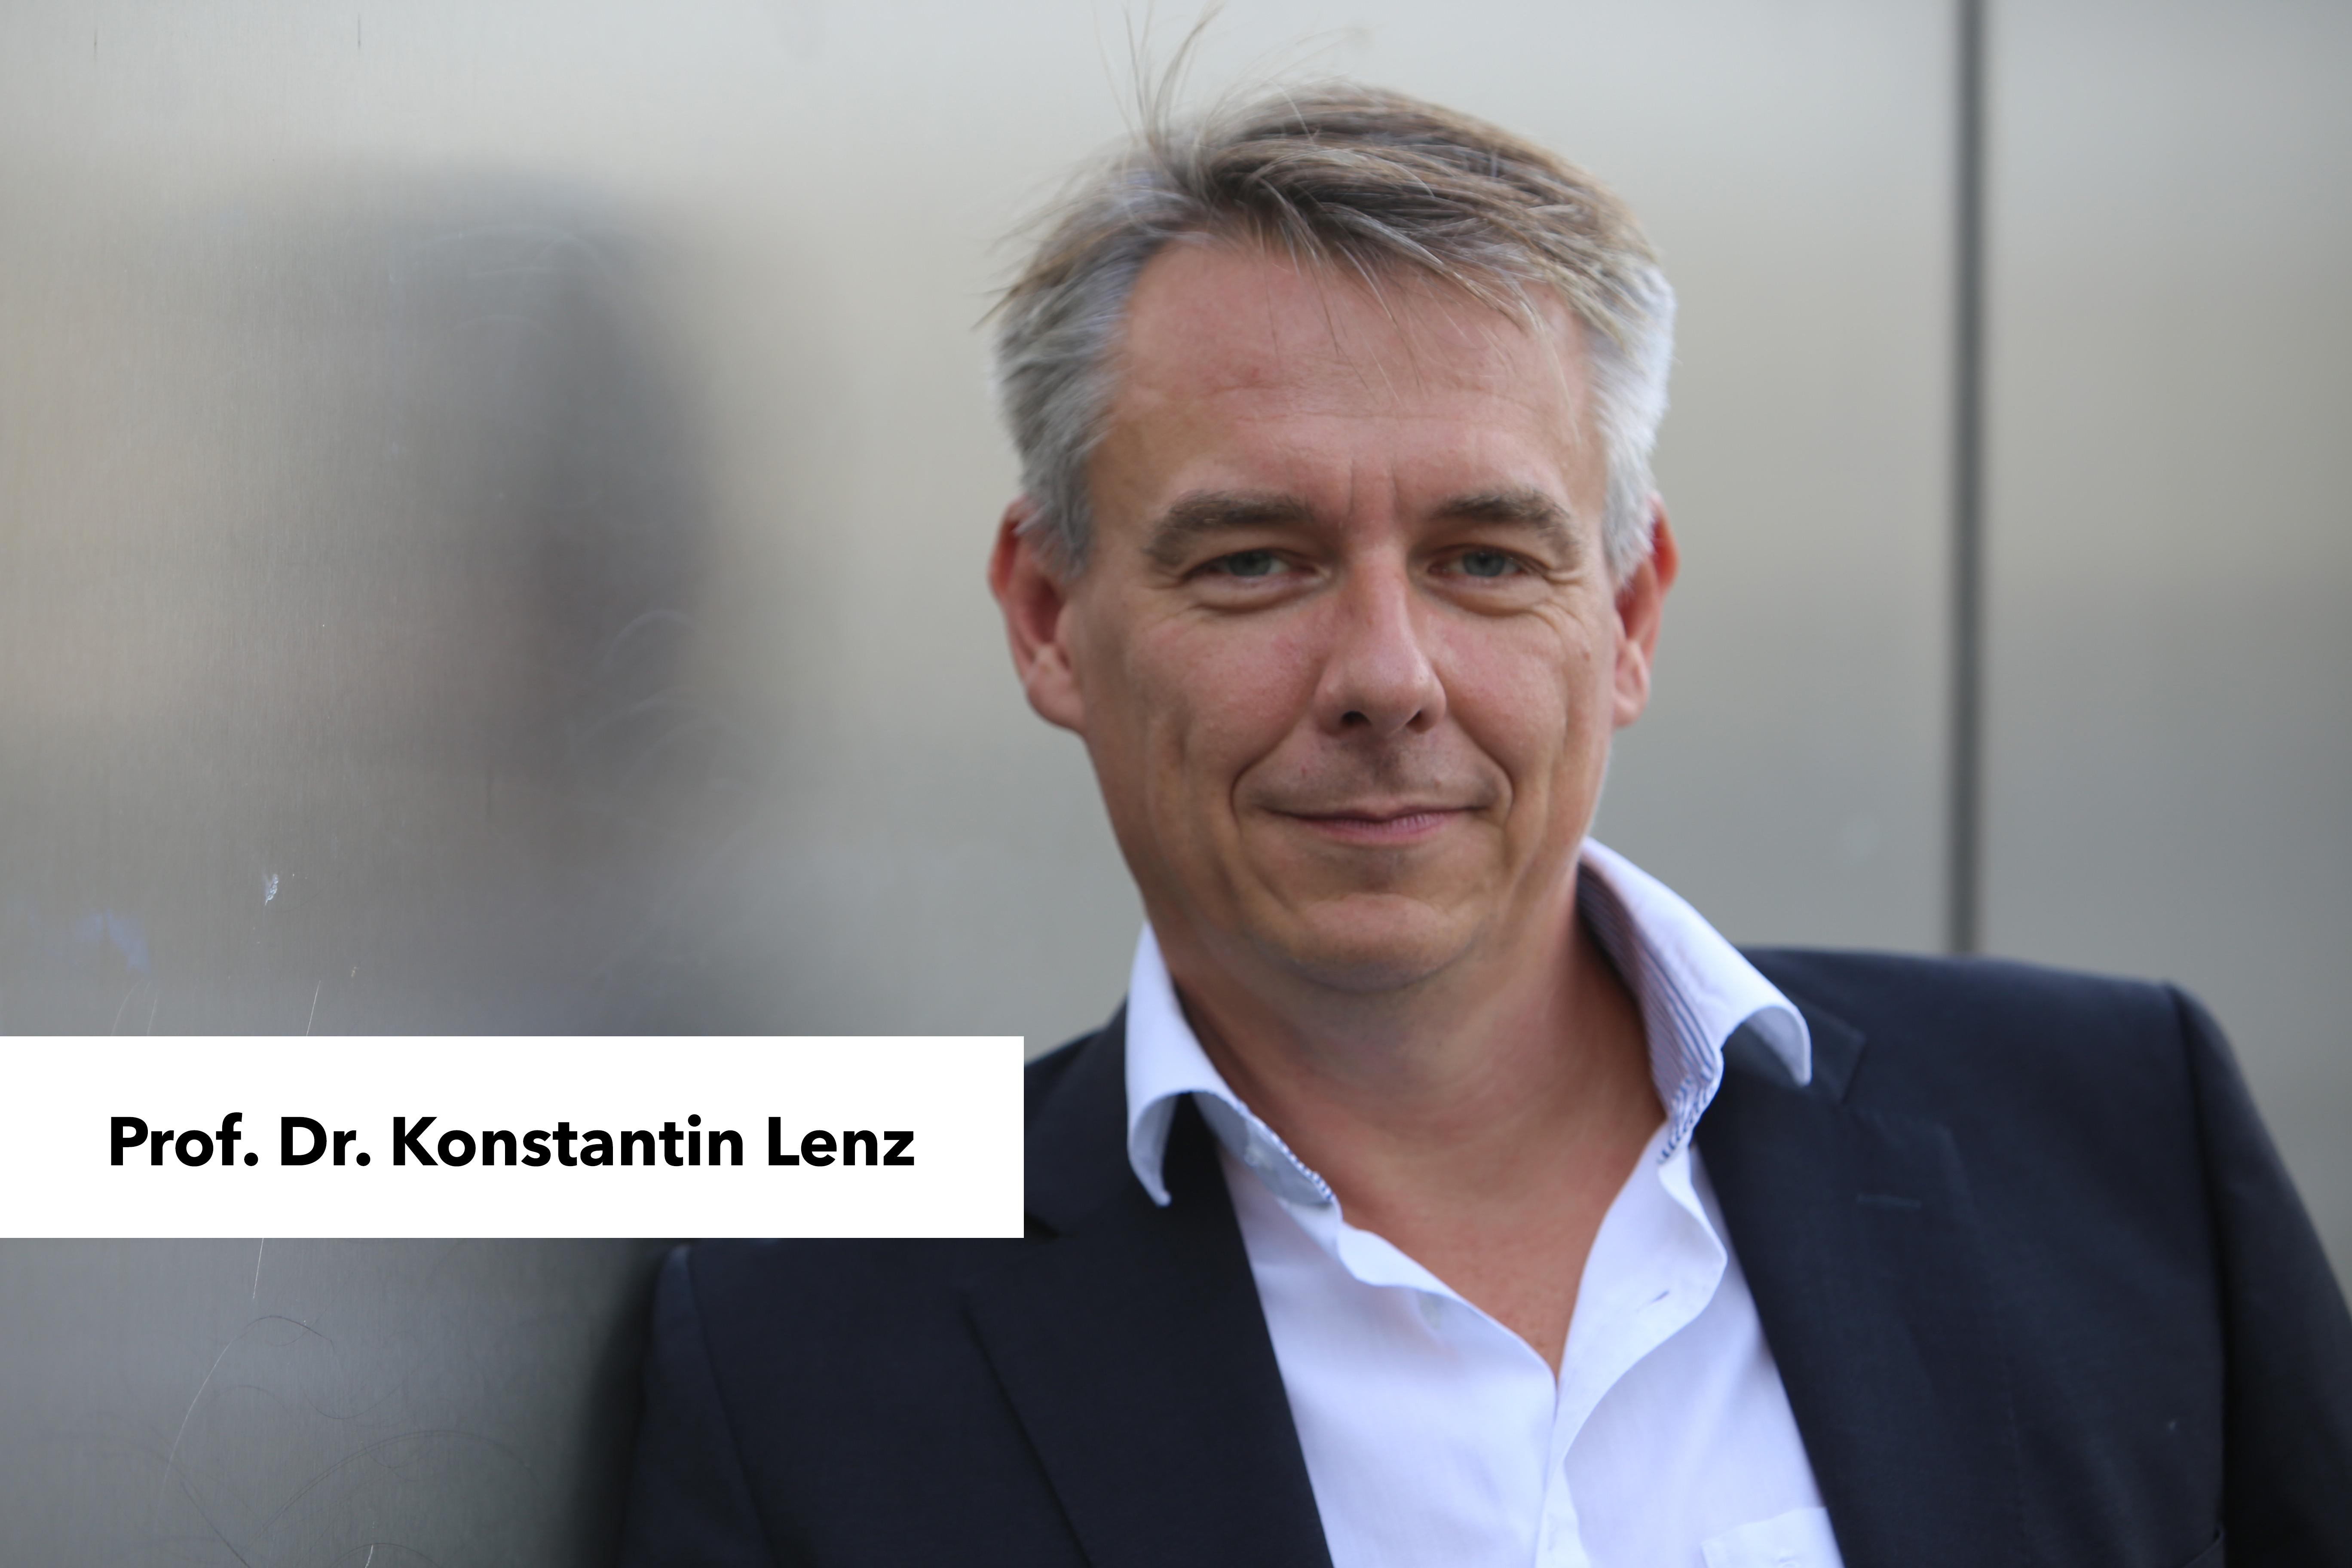 Prof. Dr. Konstantin Lenz